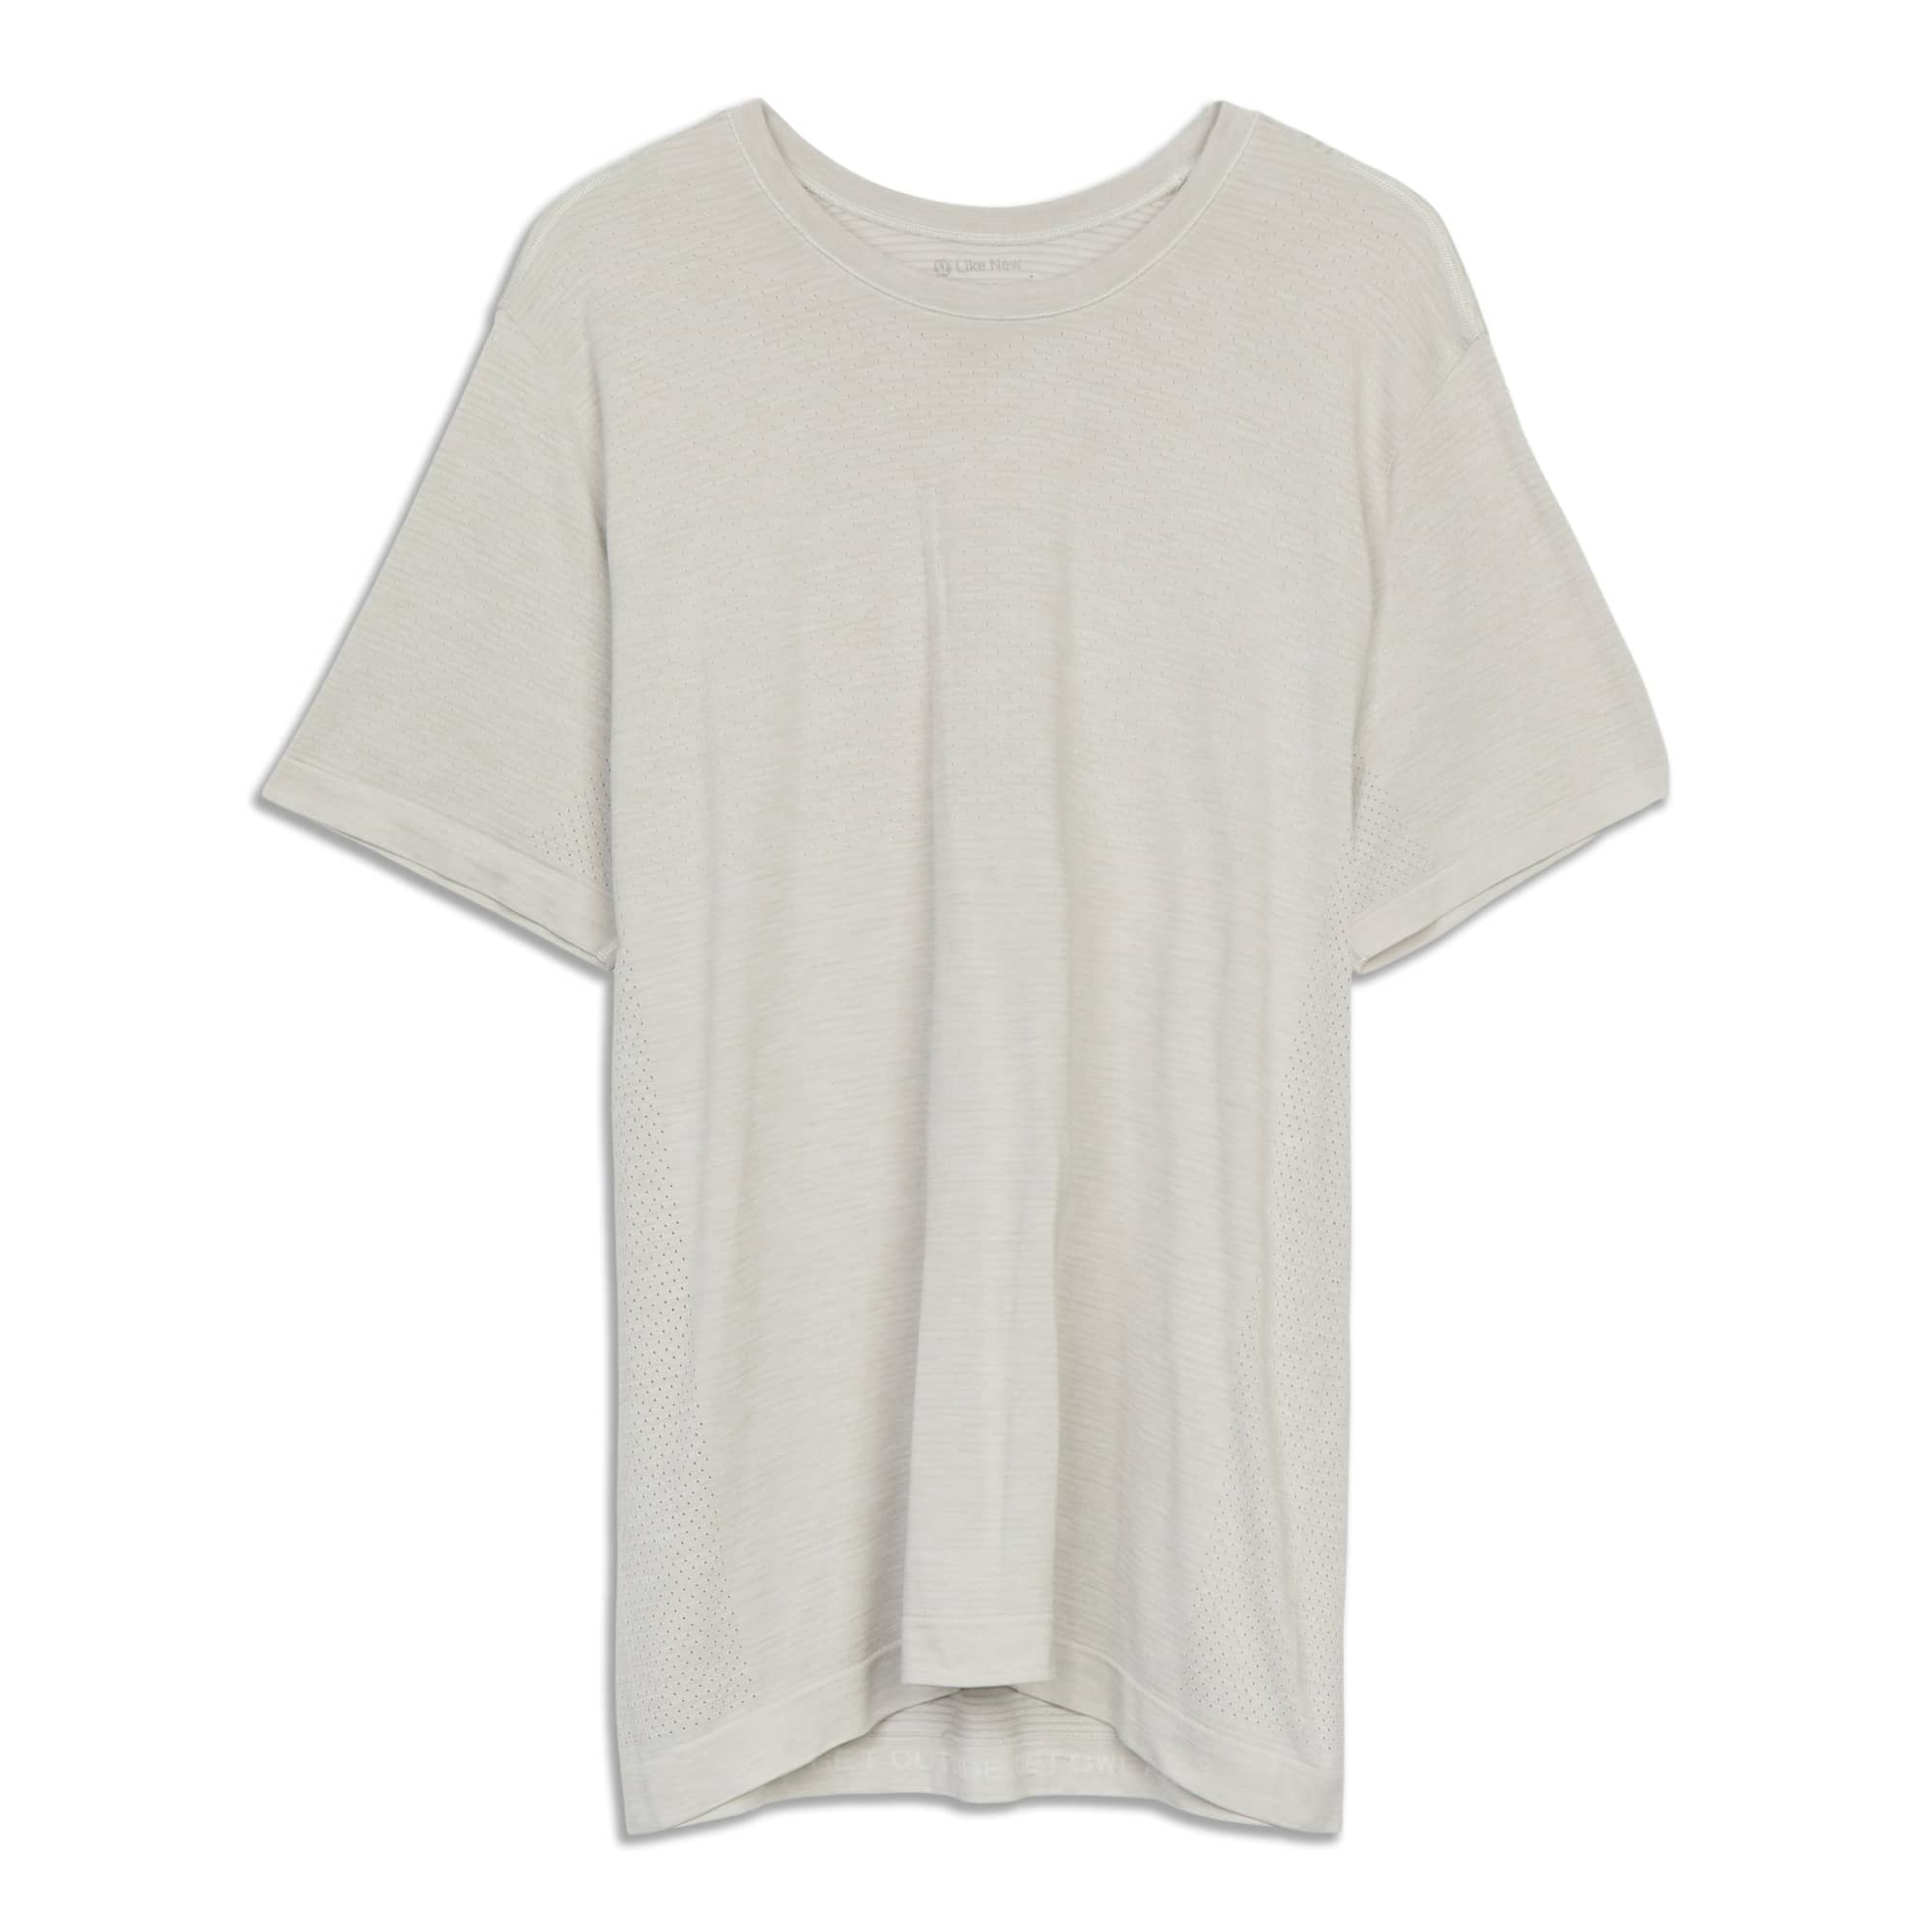 Main product image: Metal Vent Breathe Short Sleeve Shirt - Resale